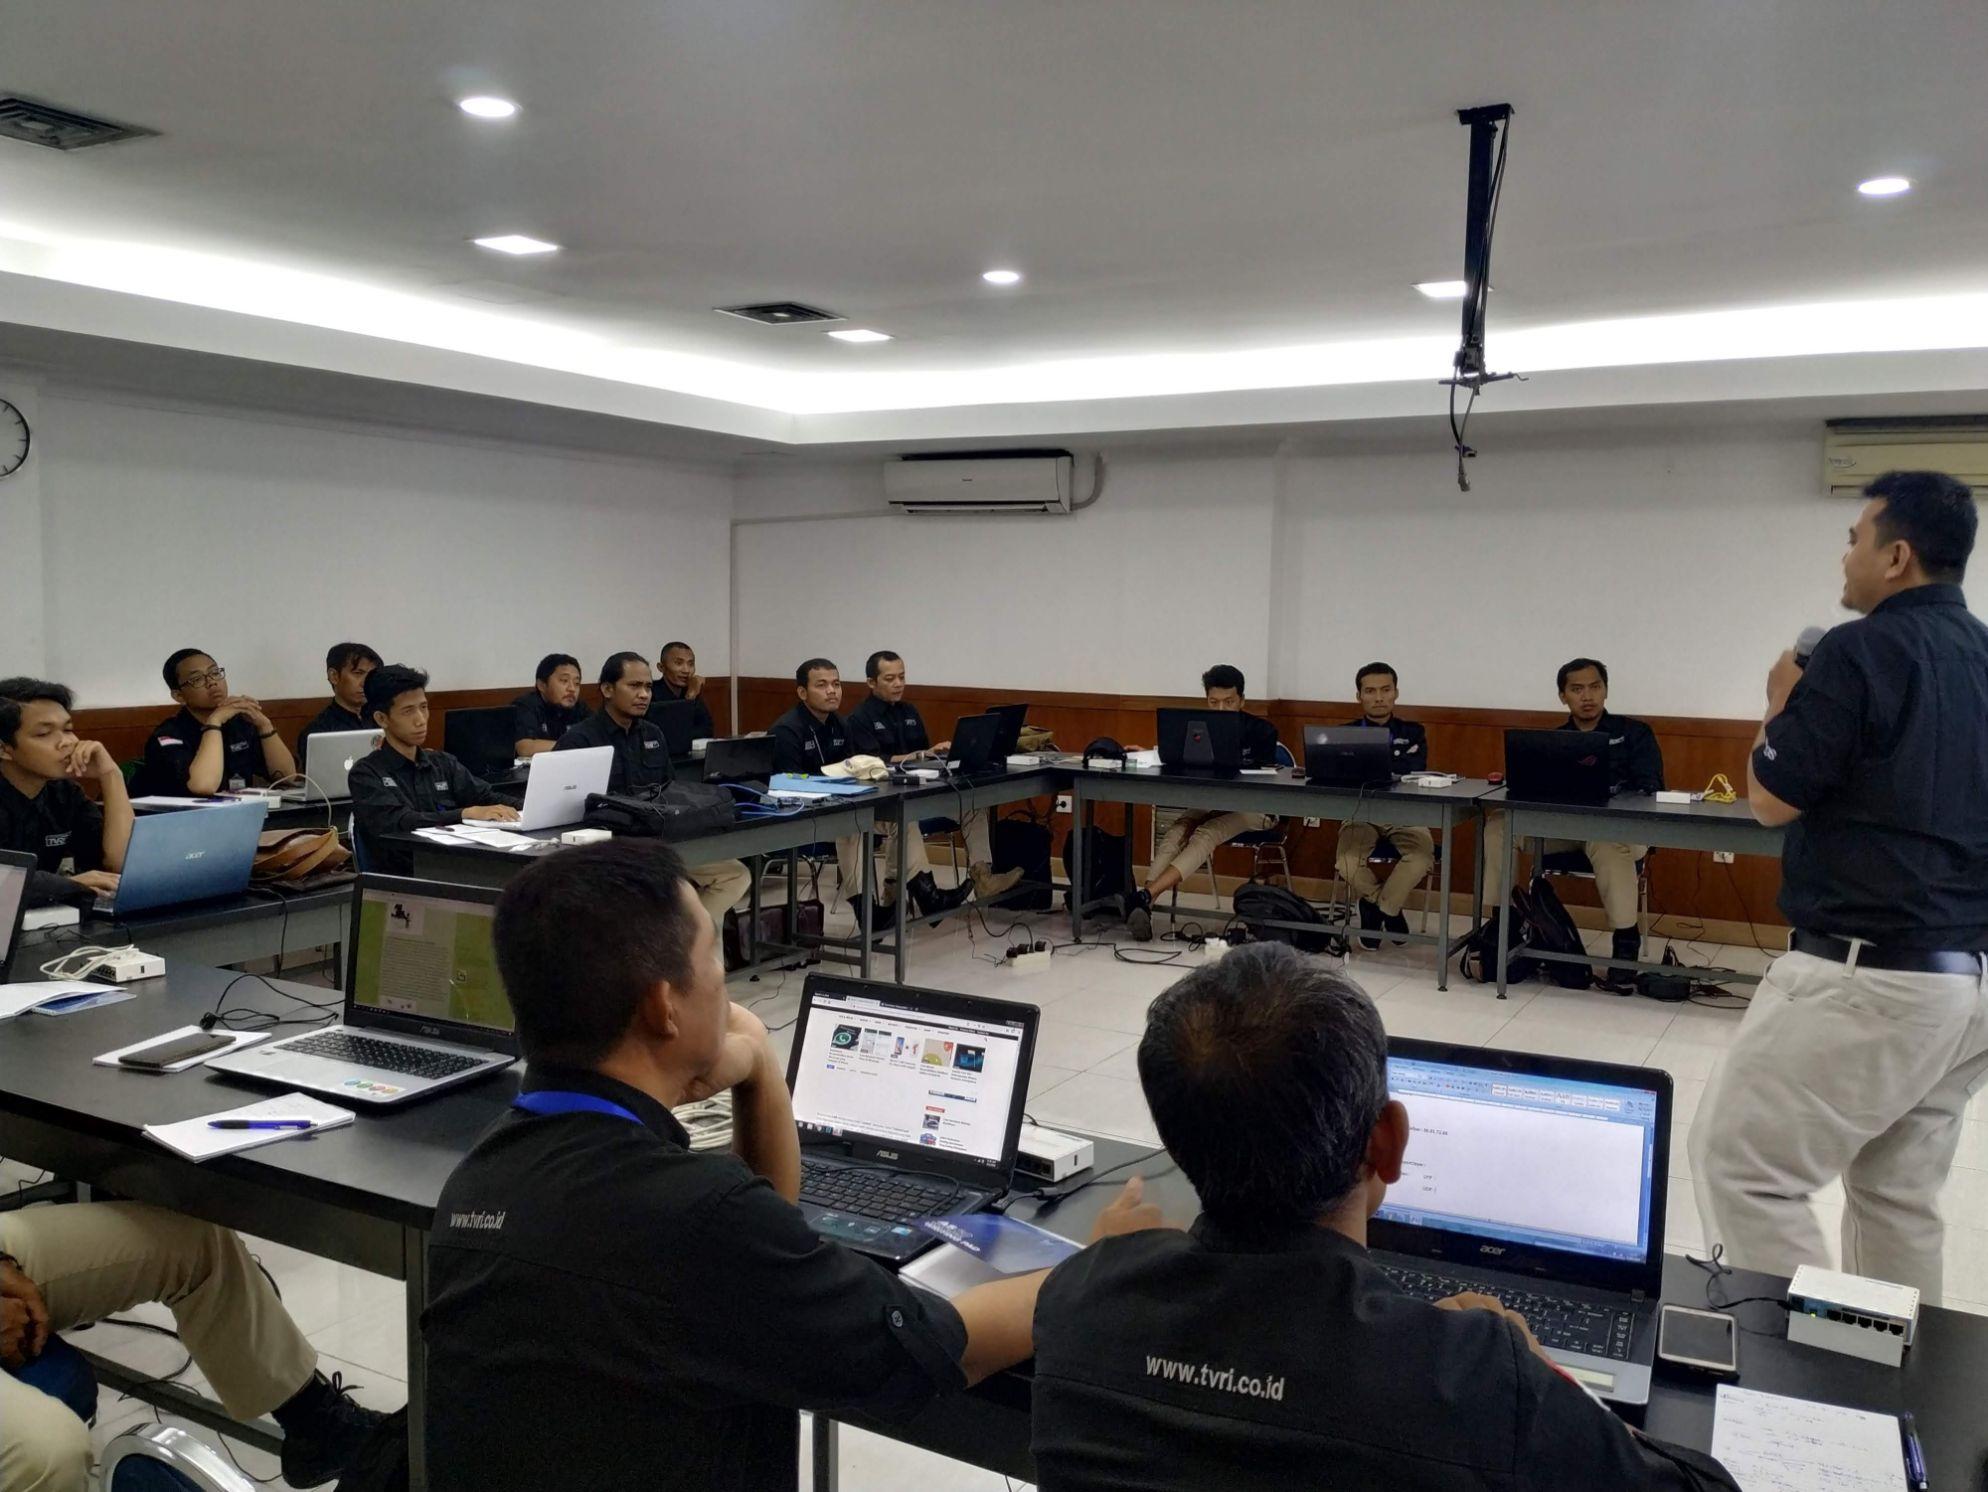 belajar, mikrotik, sertifikasi, training, IMG_20190311_115753